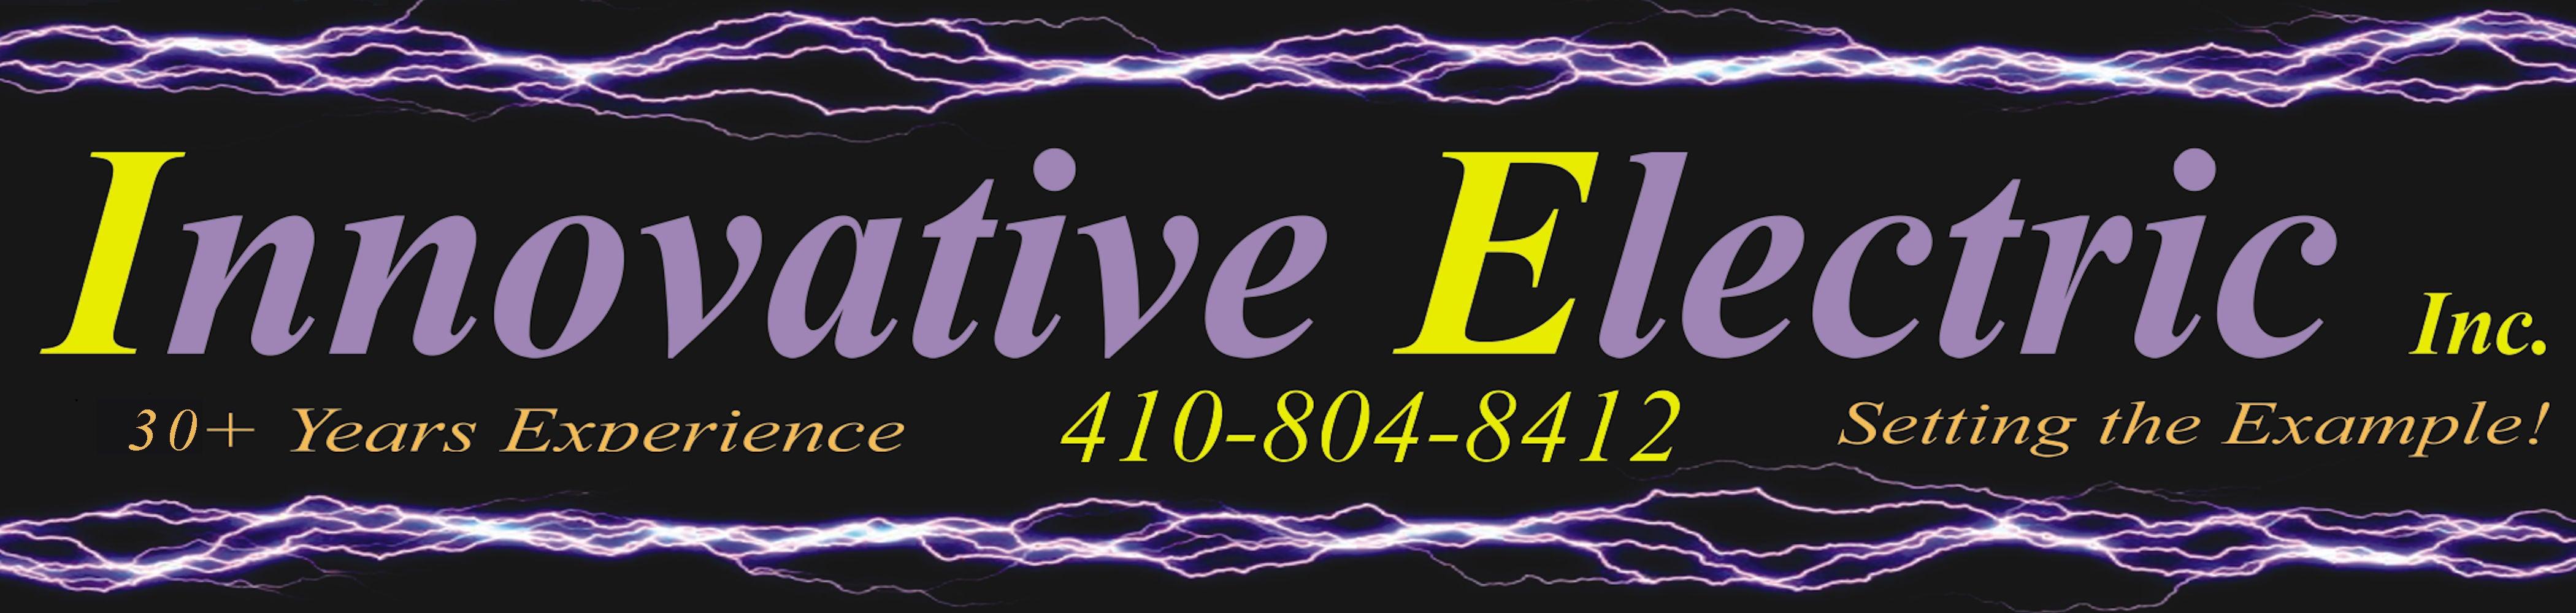 Innovative Electric Inc logo